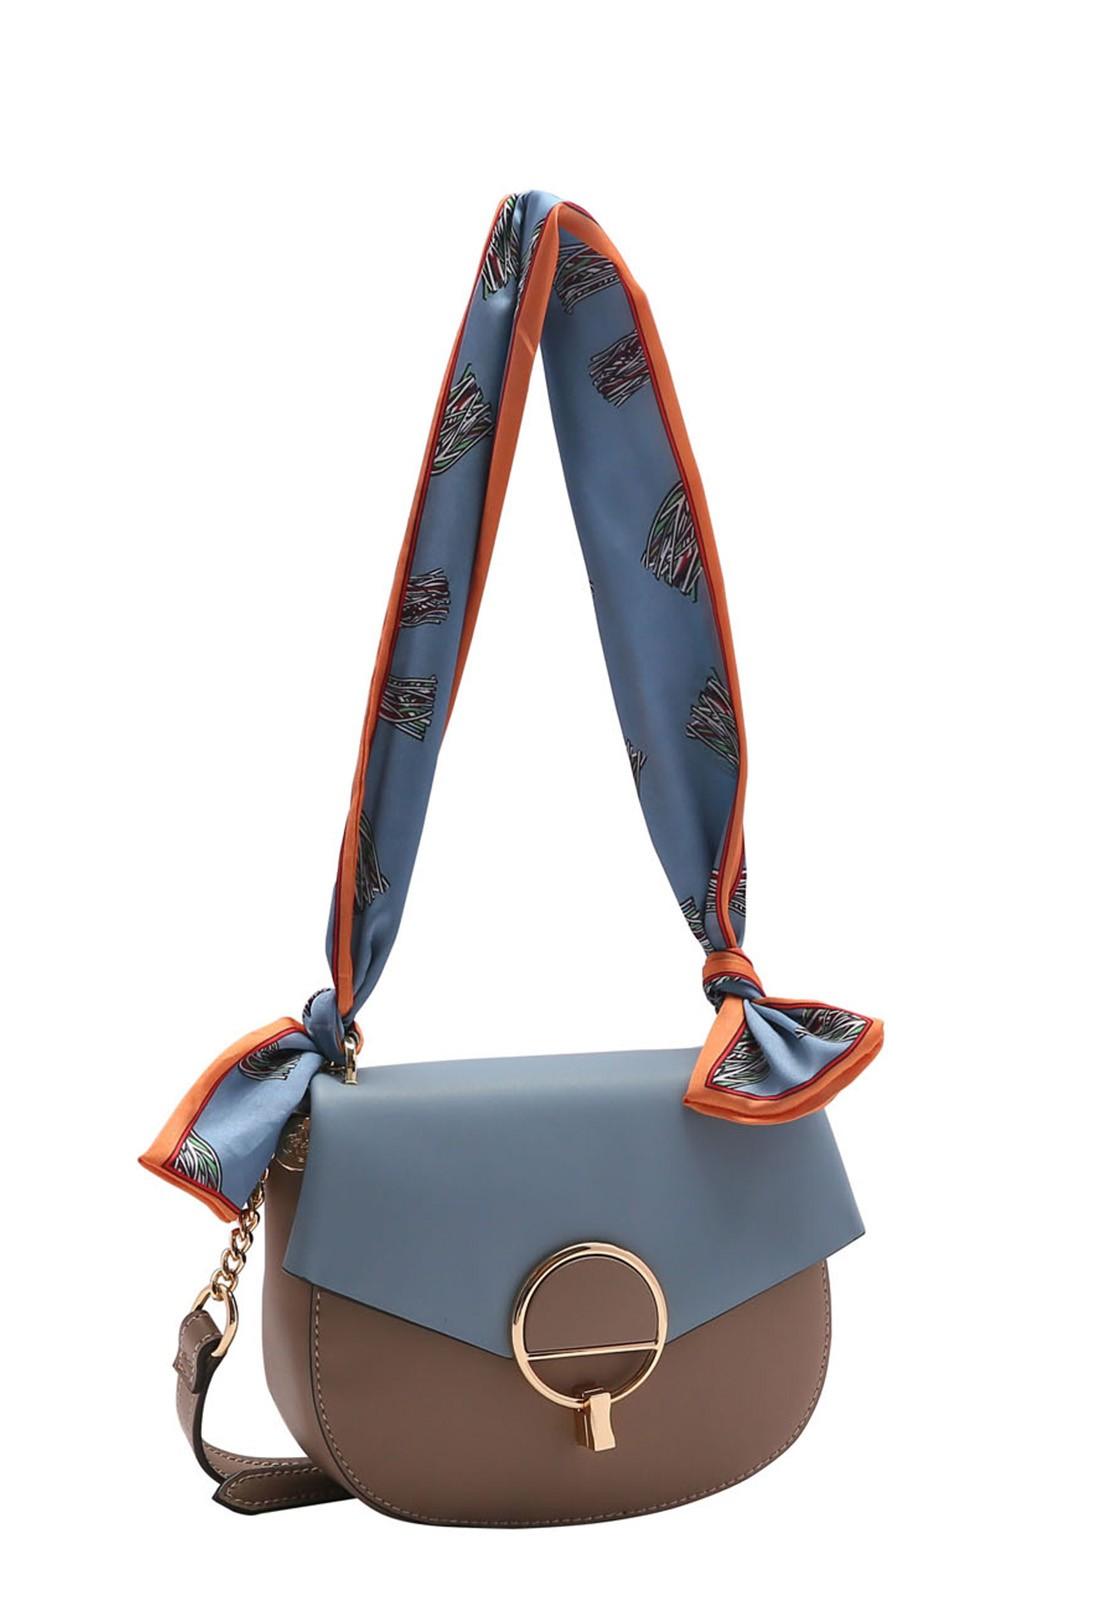 Bolsa Feminina Chenson Mini Bag Transversal - Ombro 3483288